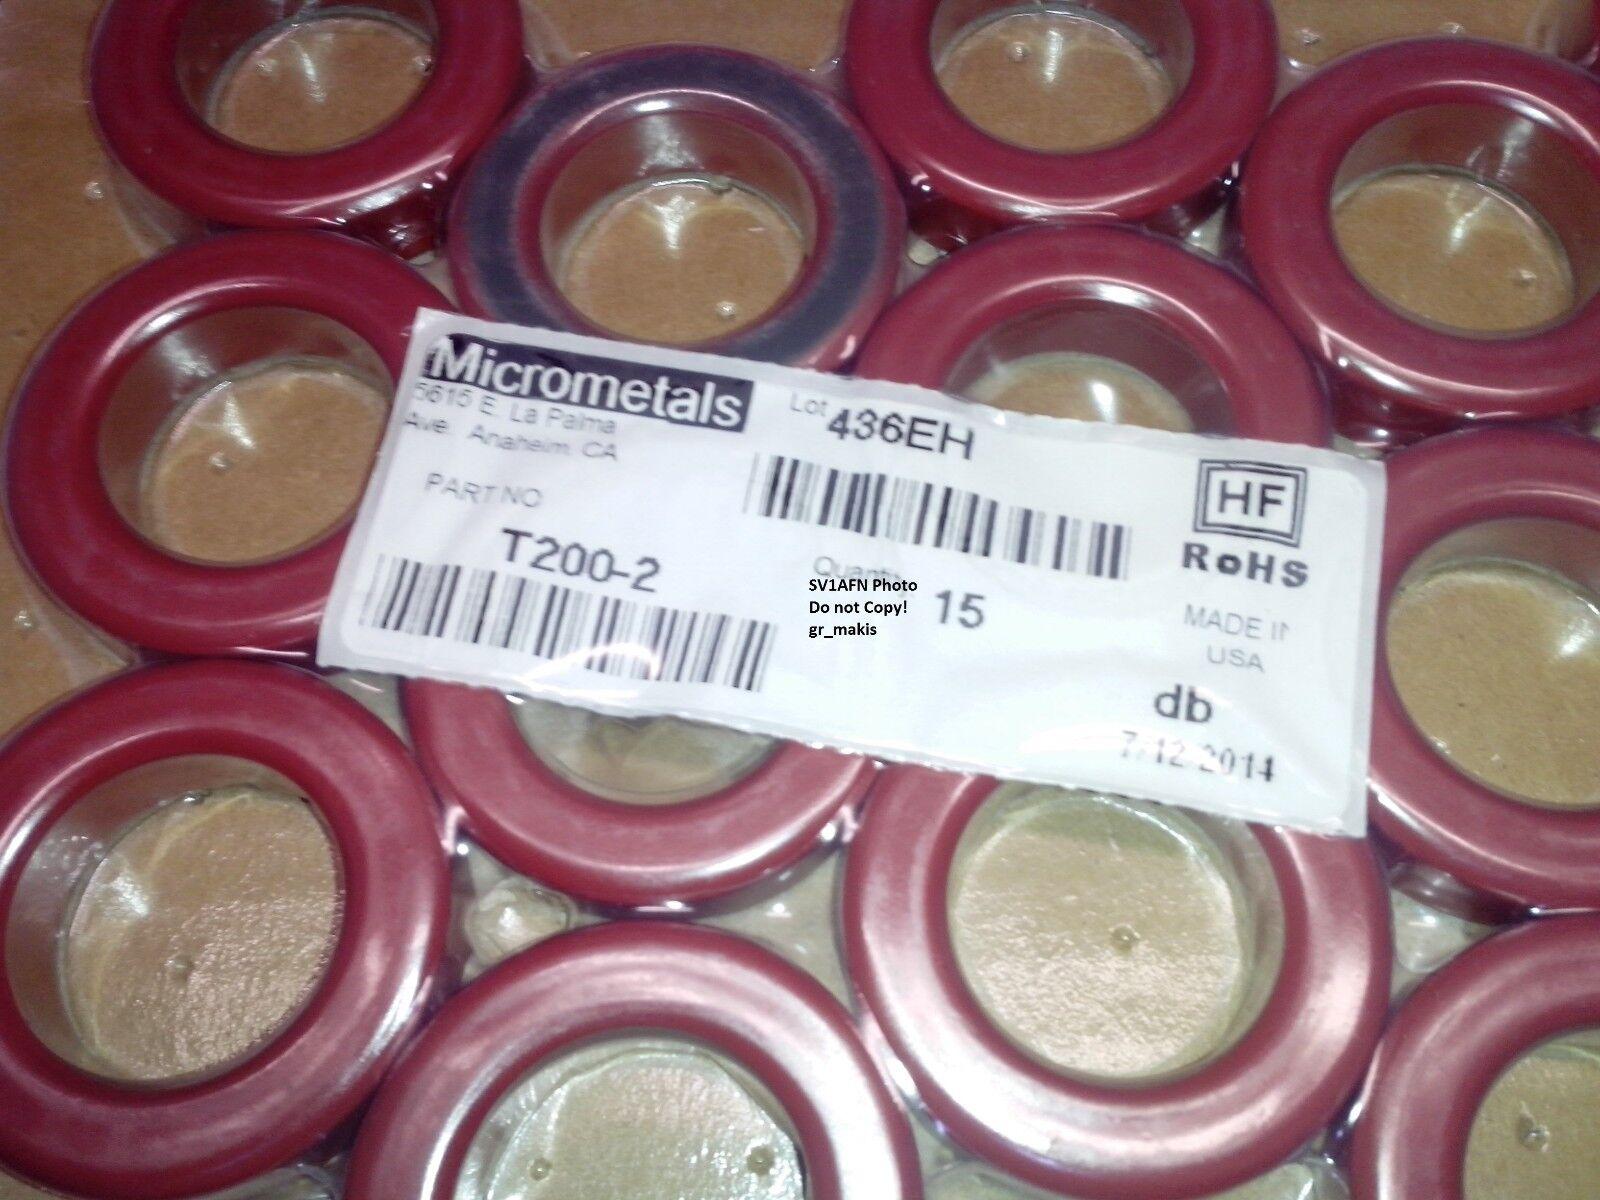 Micrometals T200 2 купить на eBay в Америке Рот